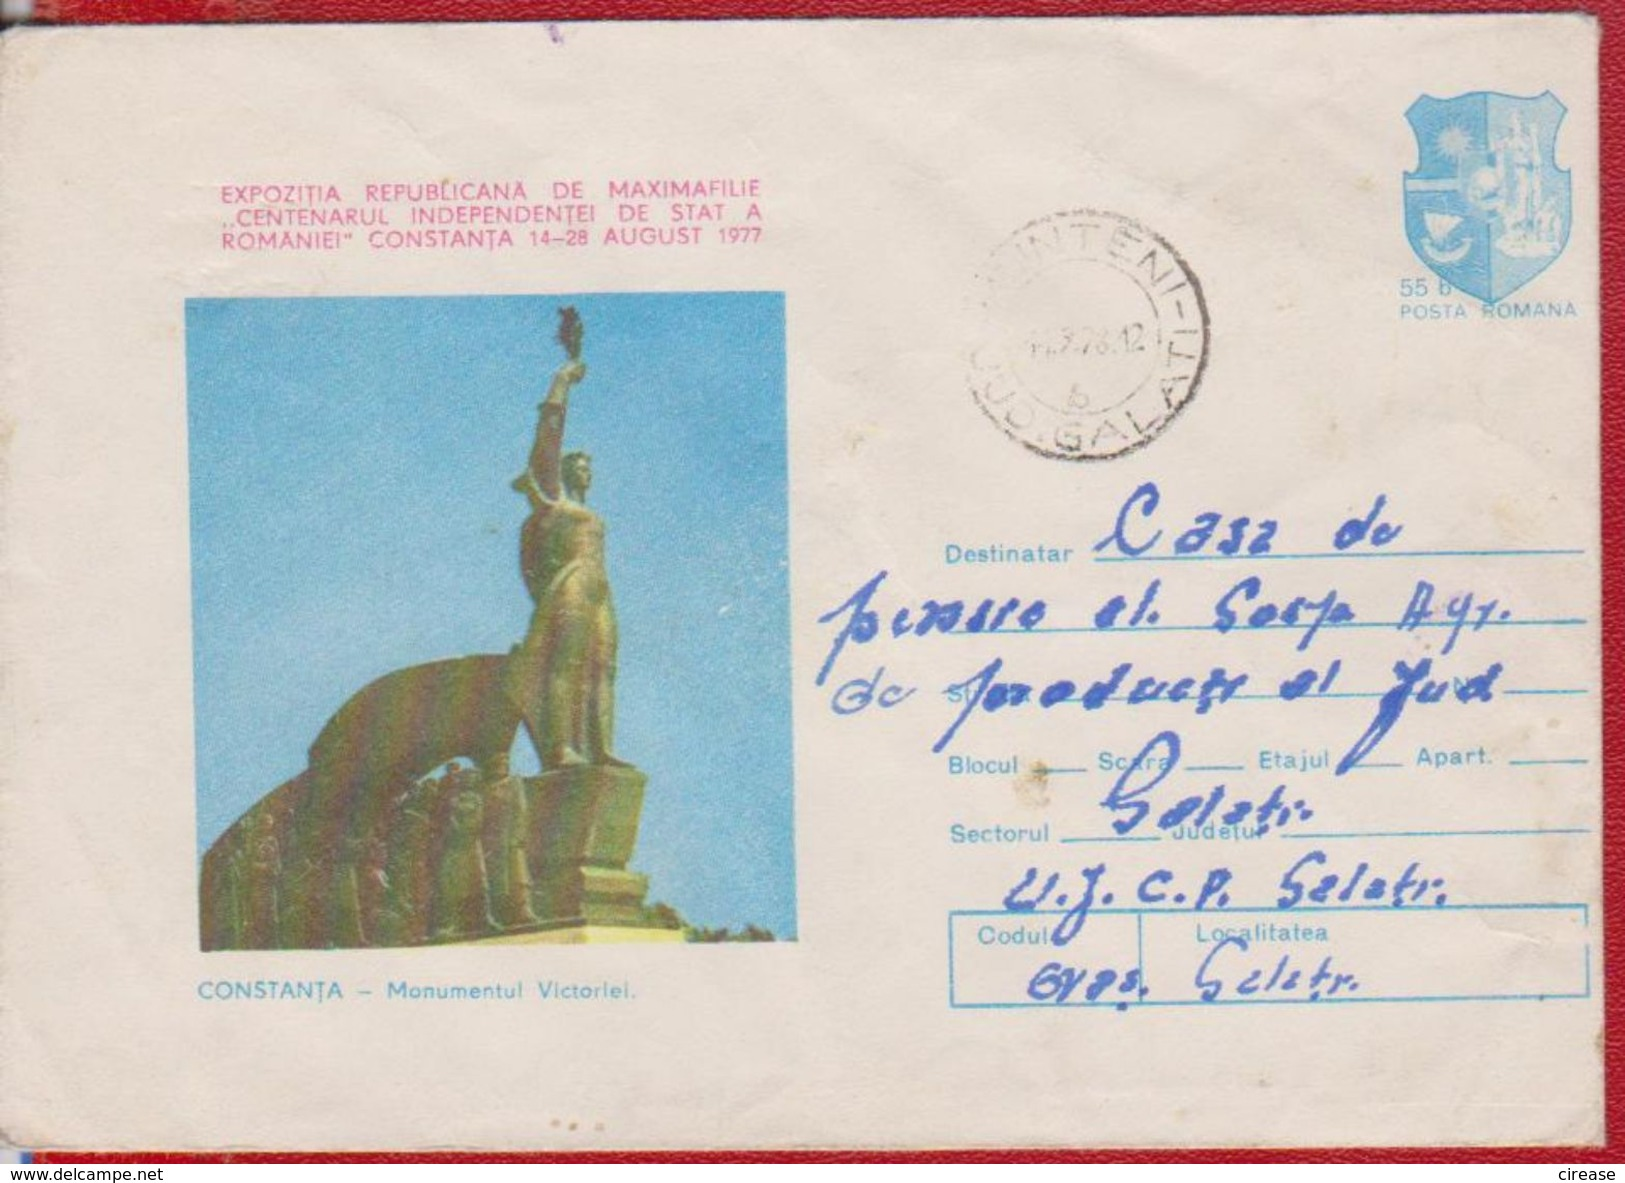 WW2 CONSTANTA VICTORY MONUMENT ROMANIA  POSTAL STATIONERY - 2. Weltkrieg